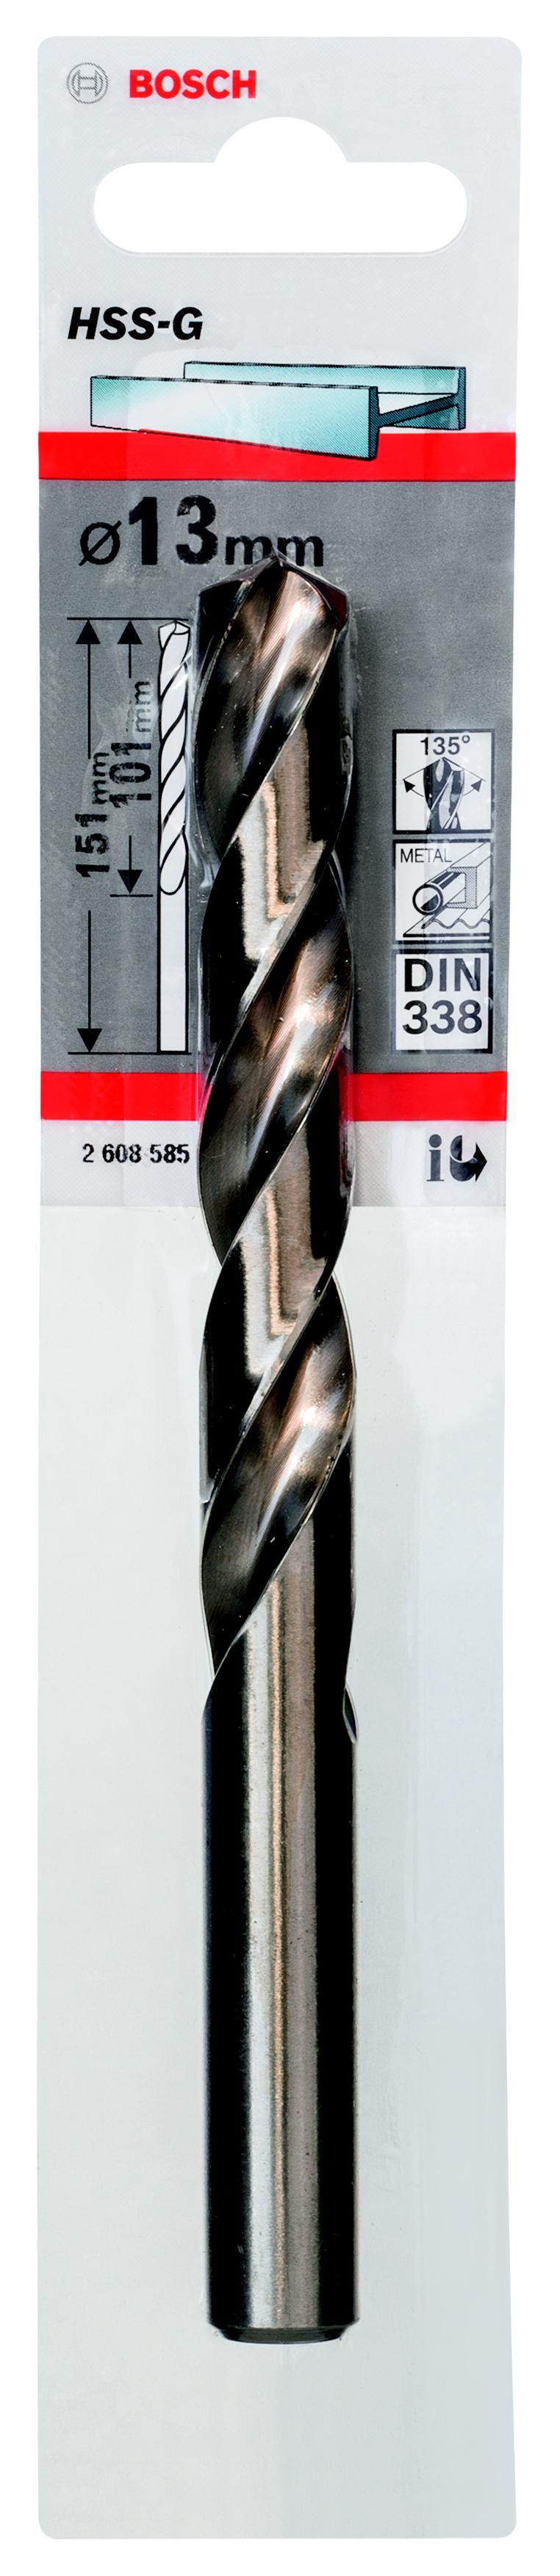 Сверло Bosch 1 hss-g (2.608.585.942) hot selling internal grooving and turning tool holder c20q qfdl05 27 c20q qfdr05 27 for zccct carbide insert ztfd0303 mg